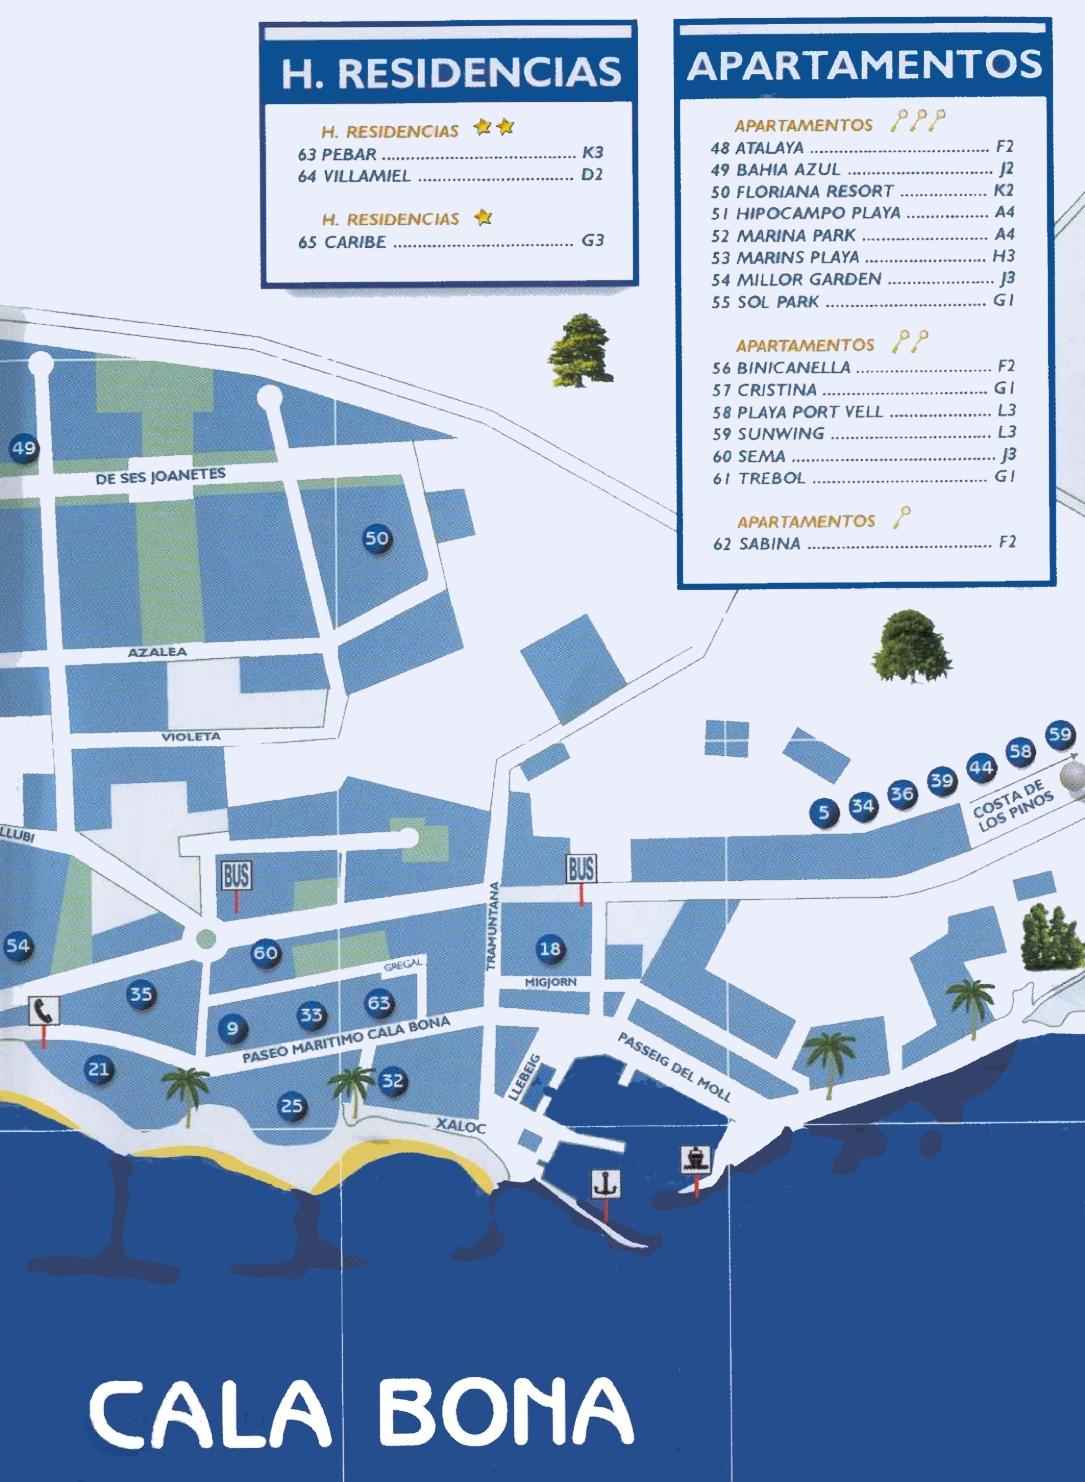 Cala Bona tourist map